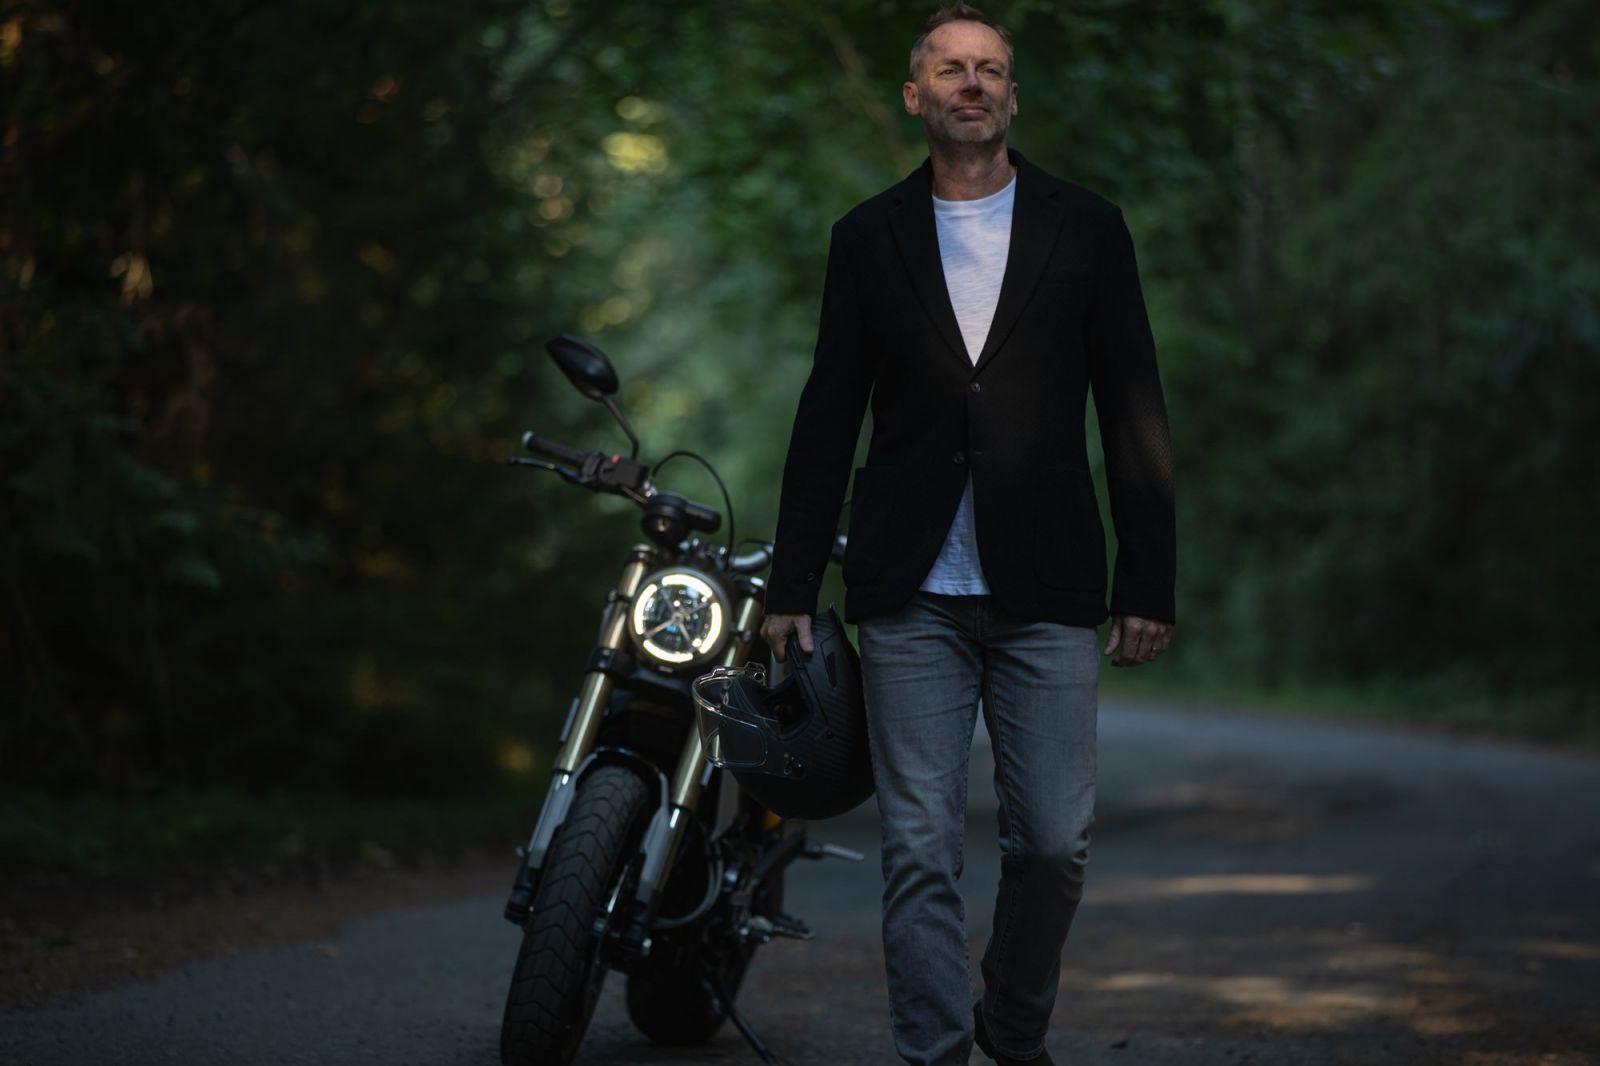 Vancouver Island Motorcycle Lifestyle Photographer